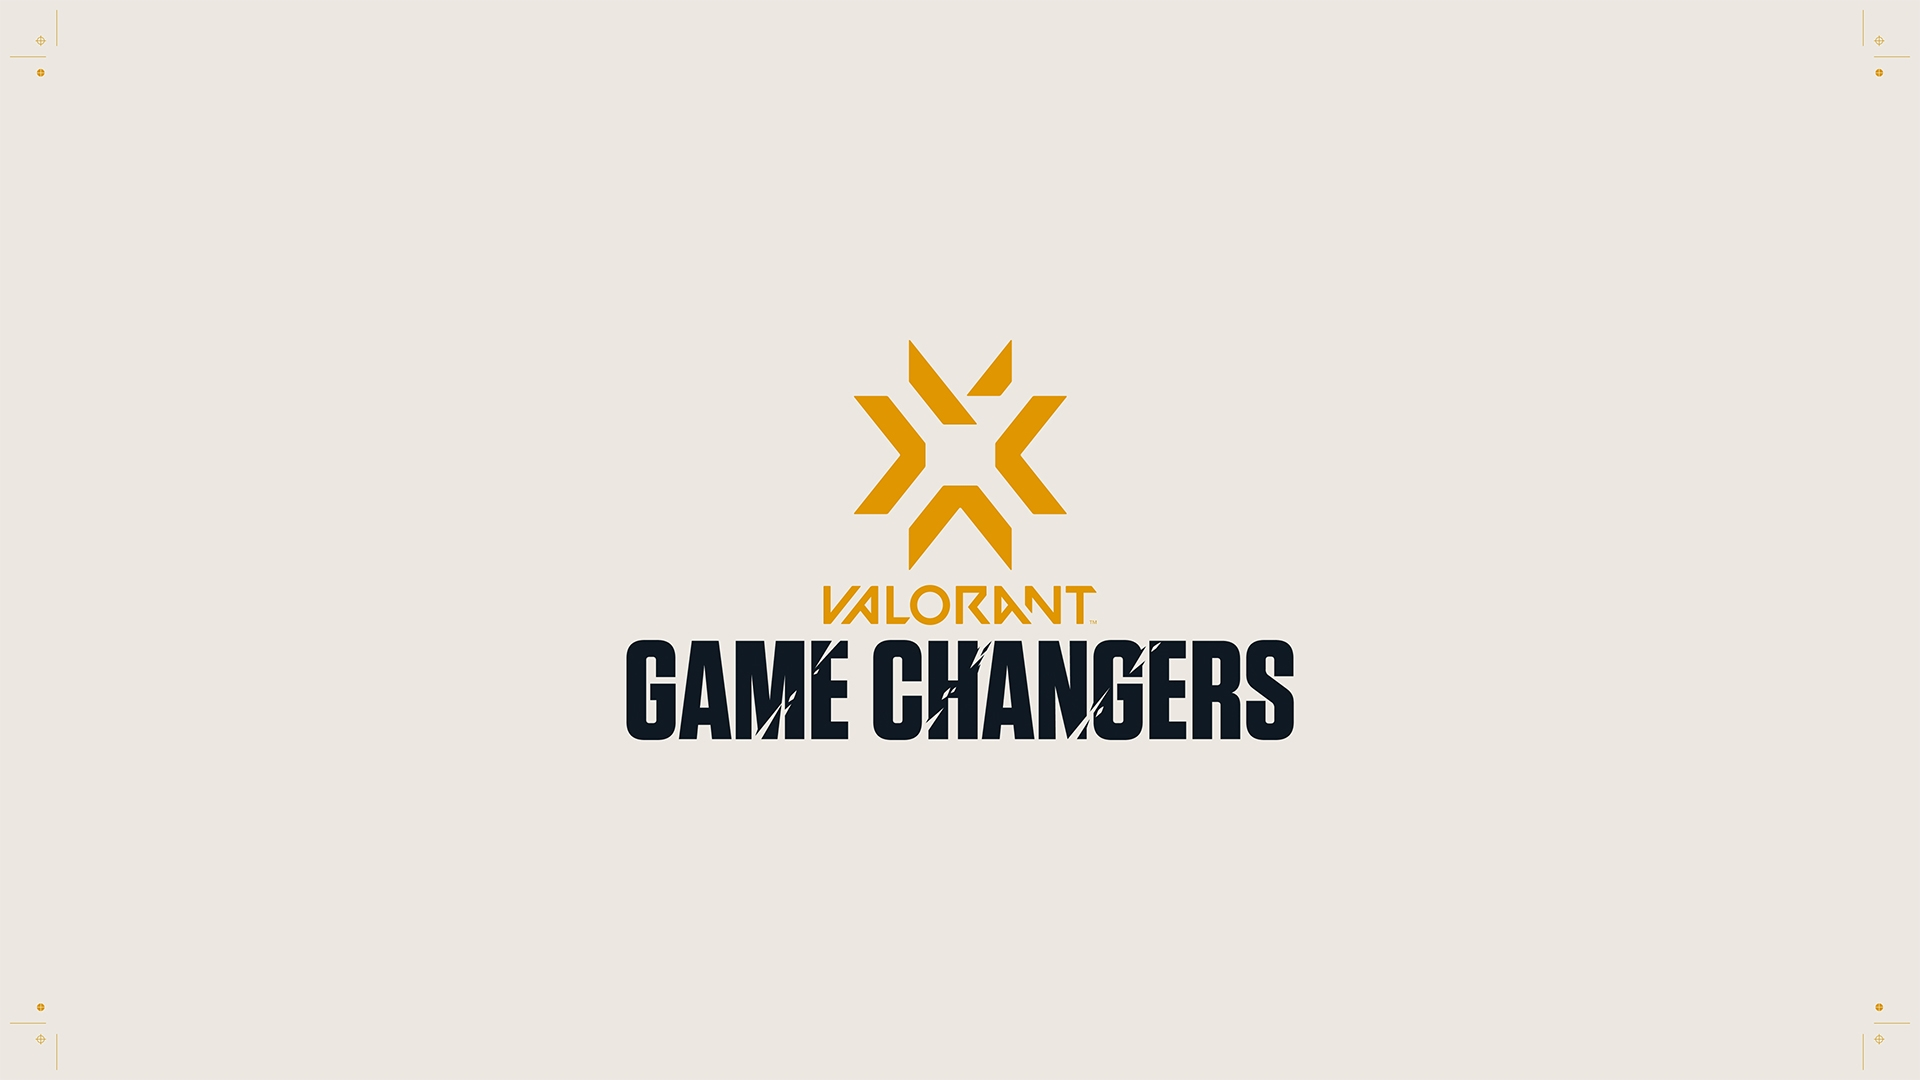 VALORANT GAME CHANGERS